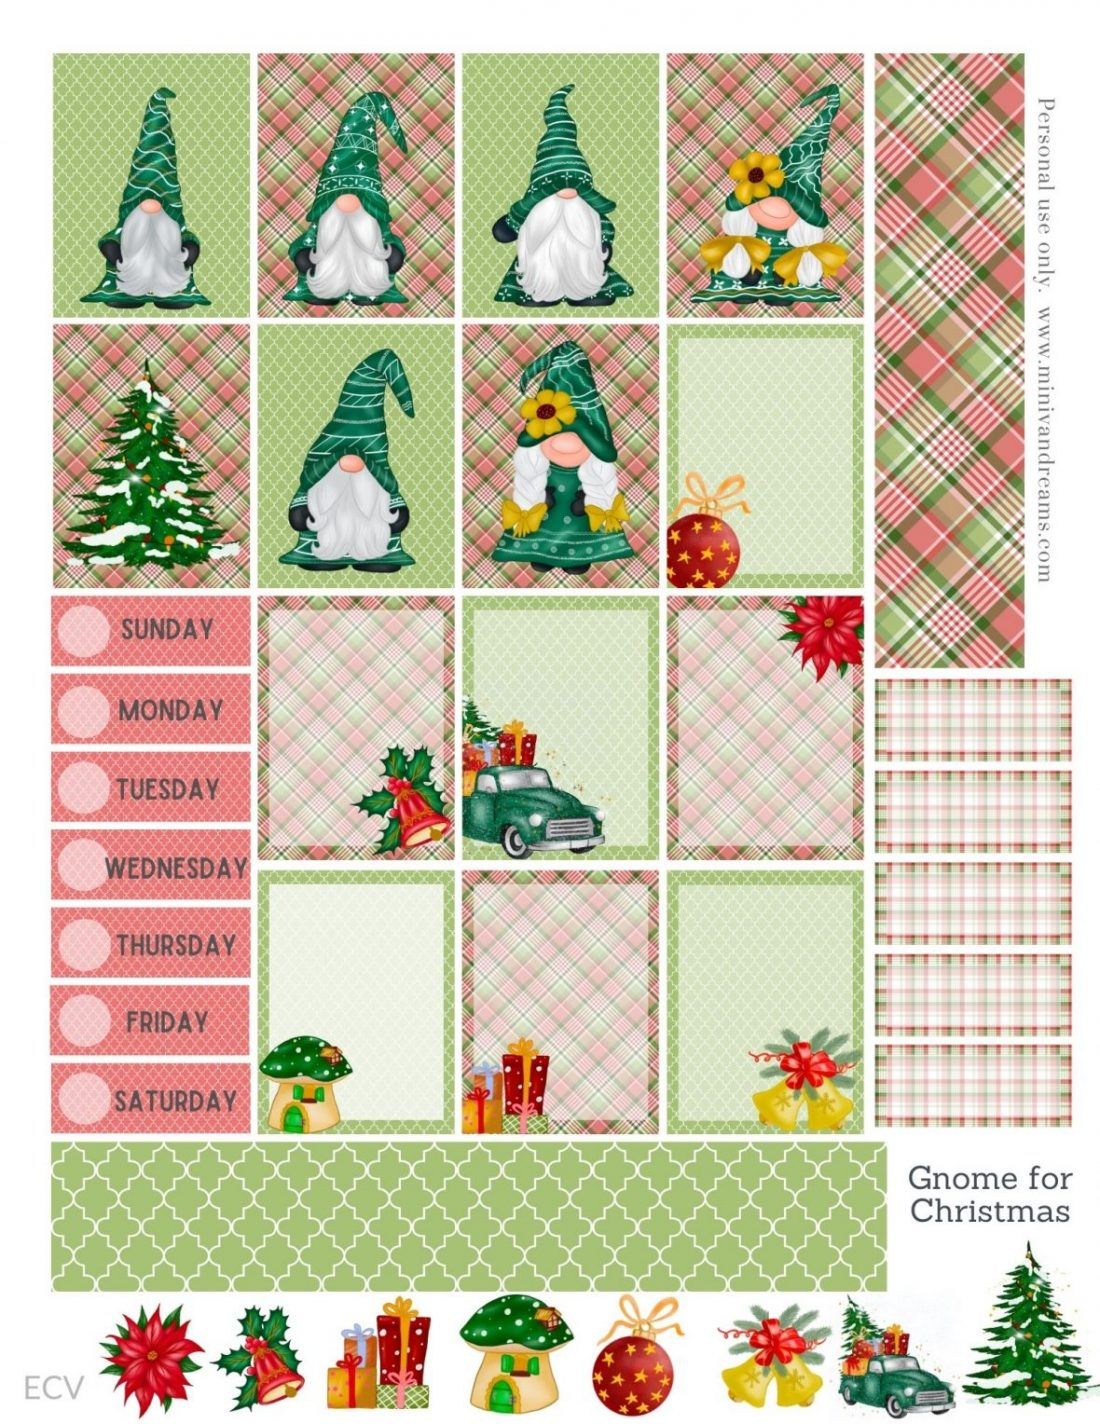 Gnome for Christmas Free Printable Planner Stickers | Mini Van Dreams